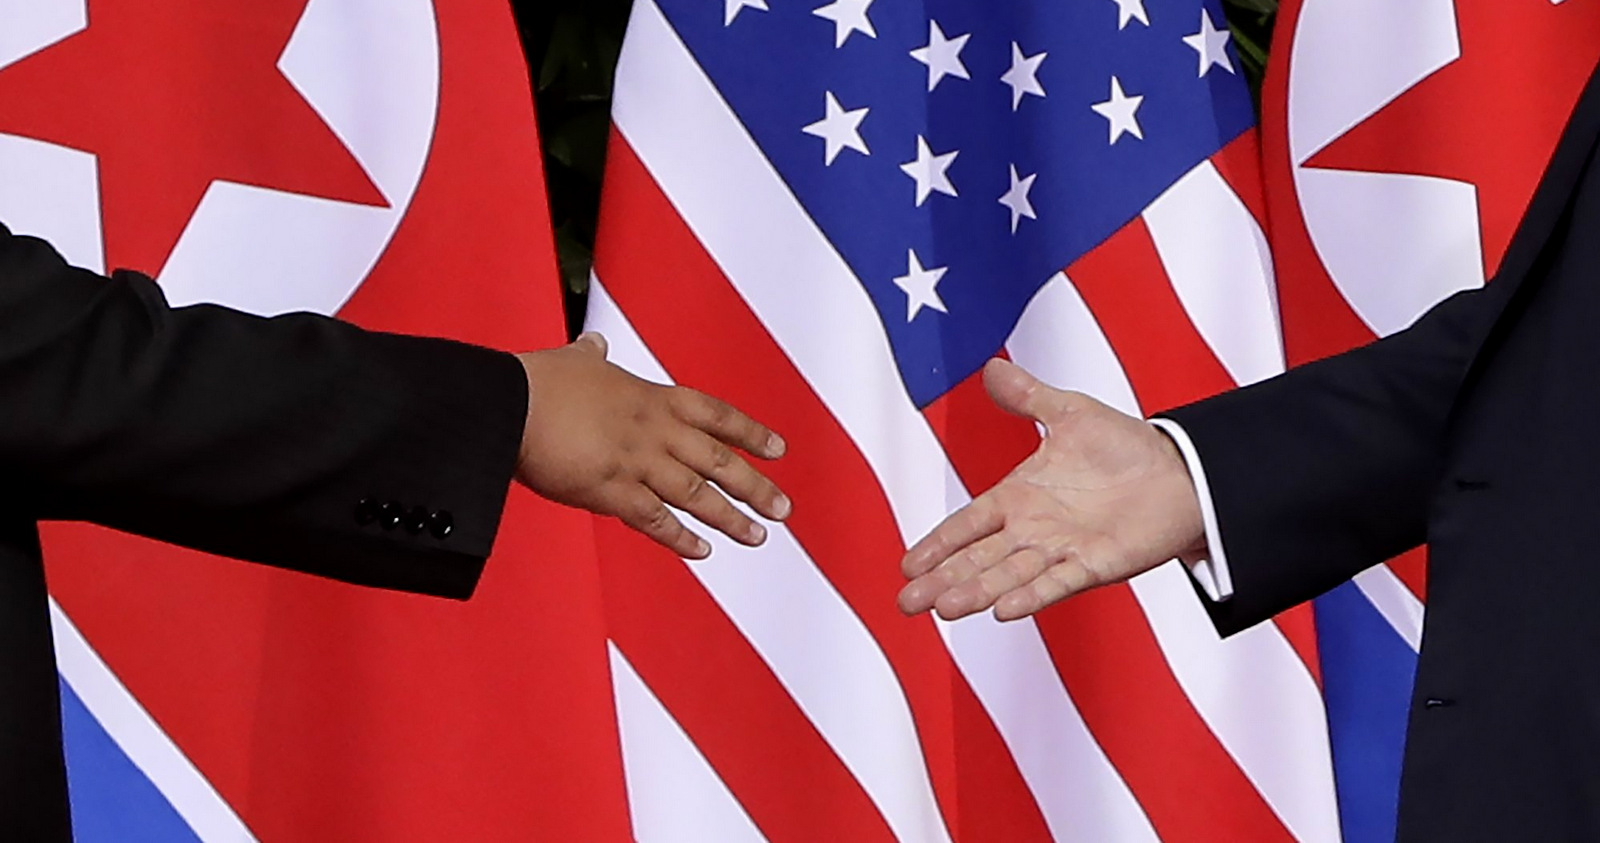 Trump-Kim Summit Raises Cautious Hopes for Peace